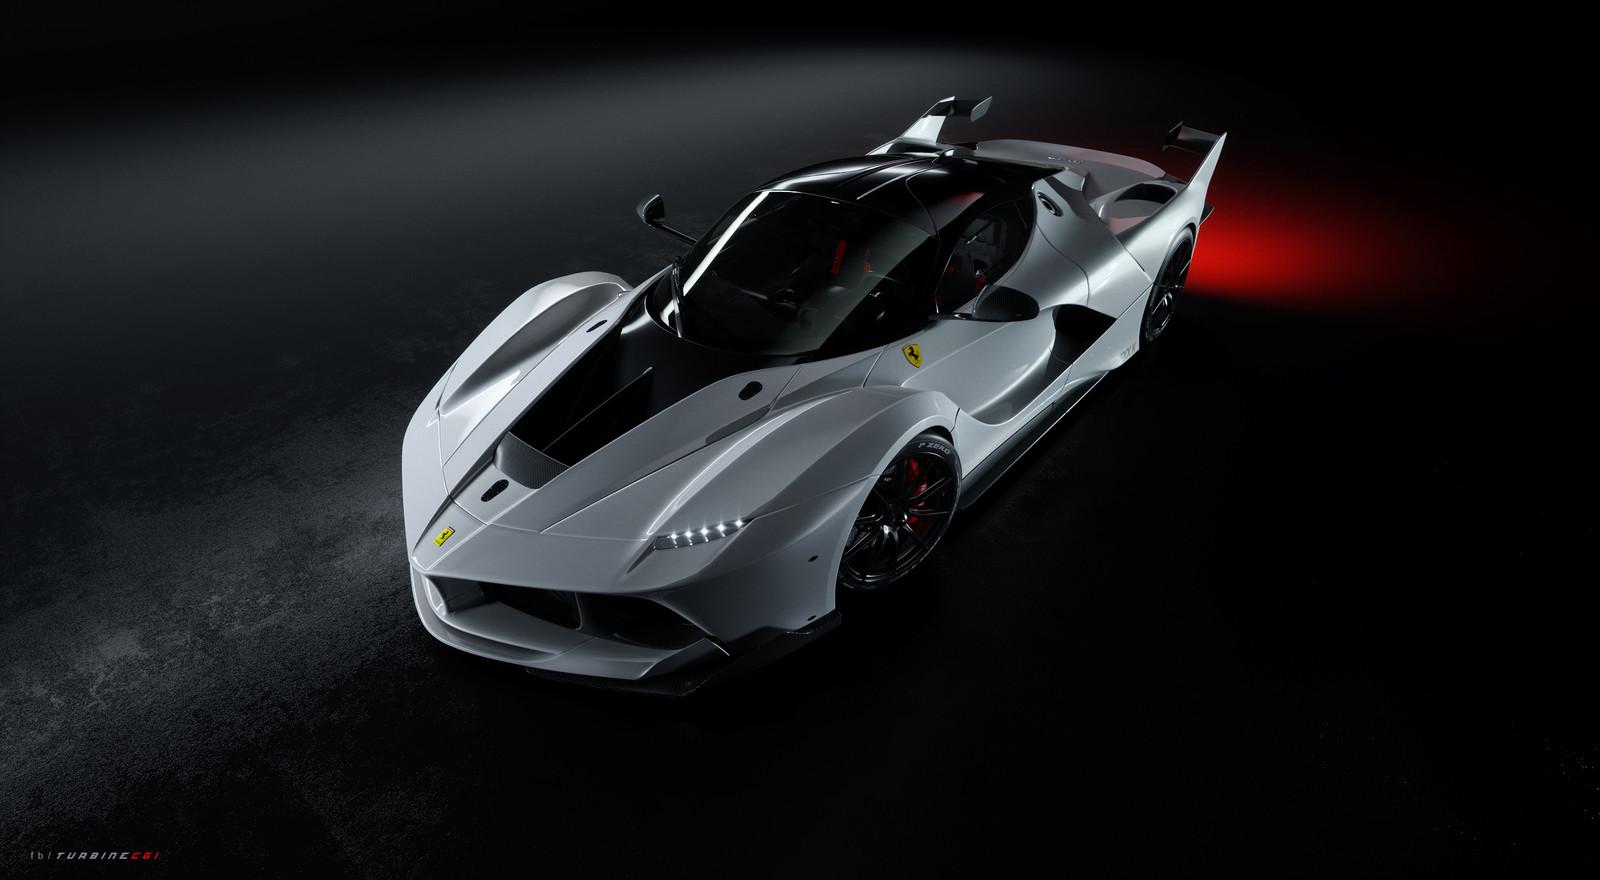 Ferrari FXXK 3rd winning entry @ AutomotiveCGI challenge.